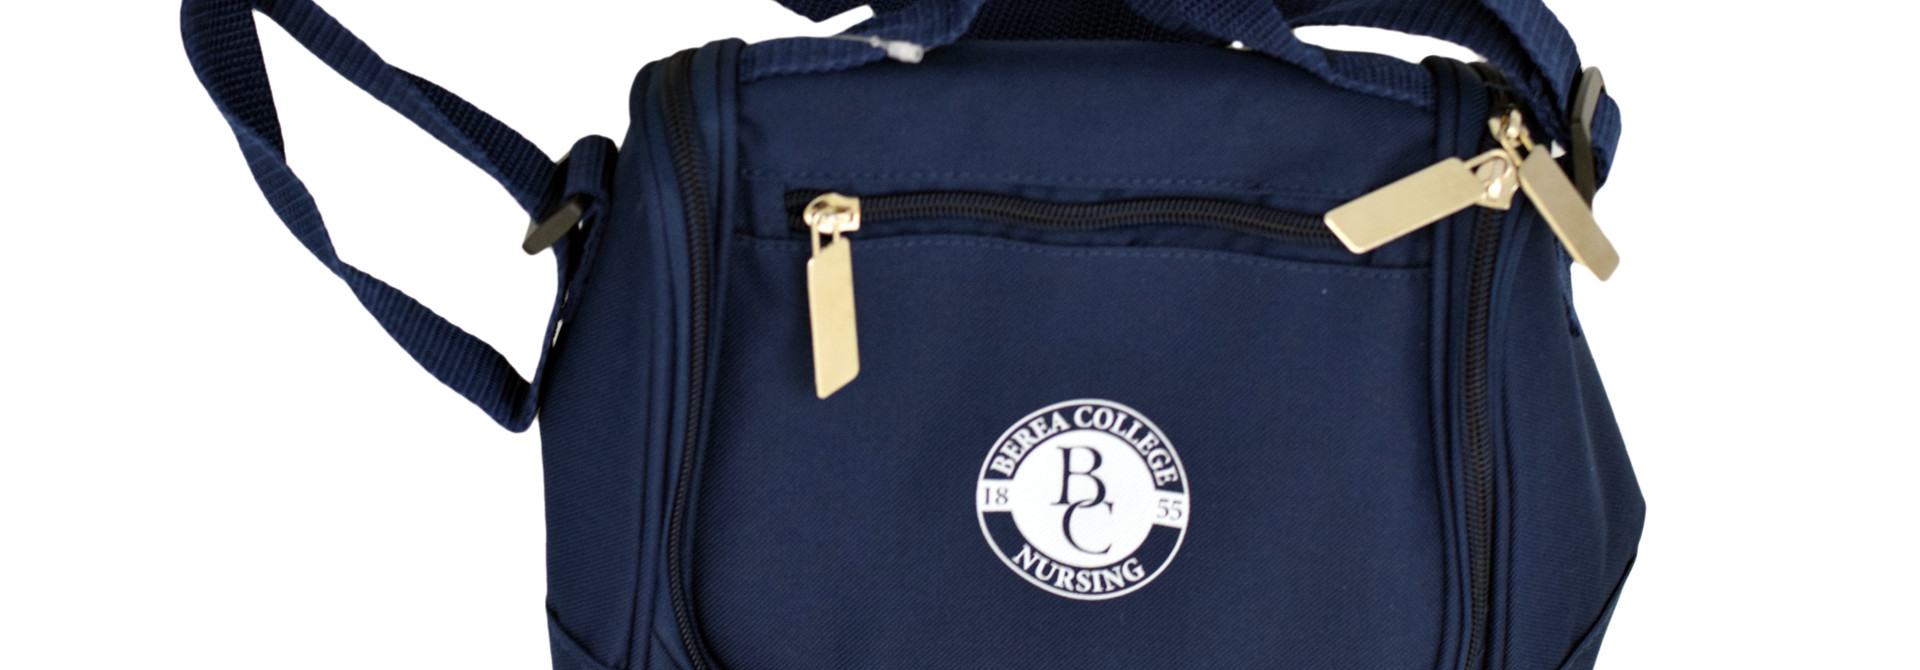 Berea College Nursing Bag